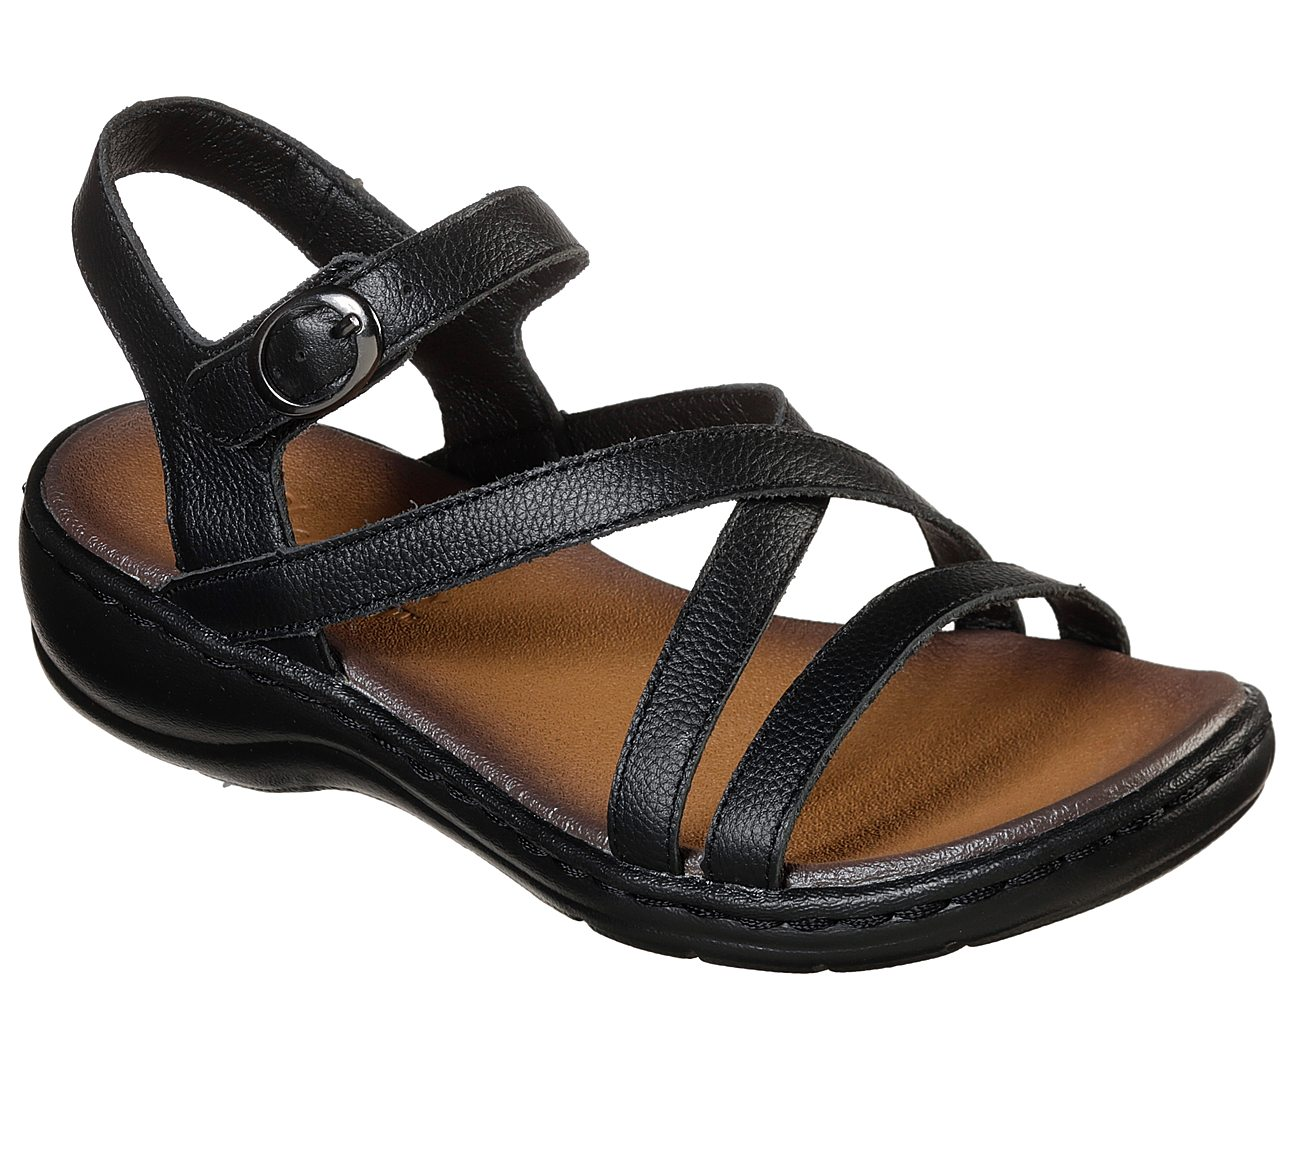 Disparates Empuje interno  Buy SKECHERS Passenger - Tahiti Dreams Exclusives Shoes